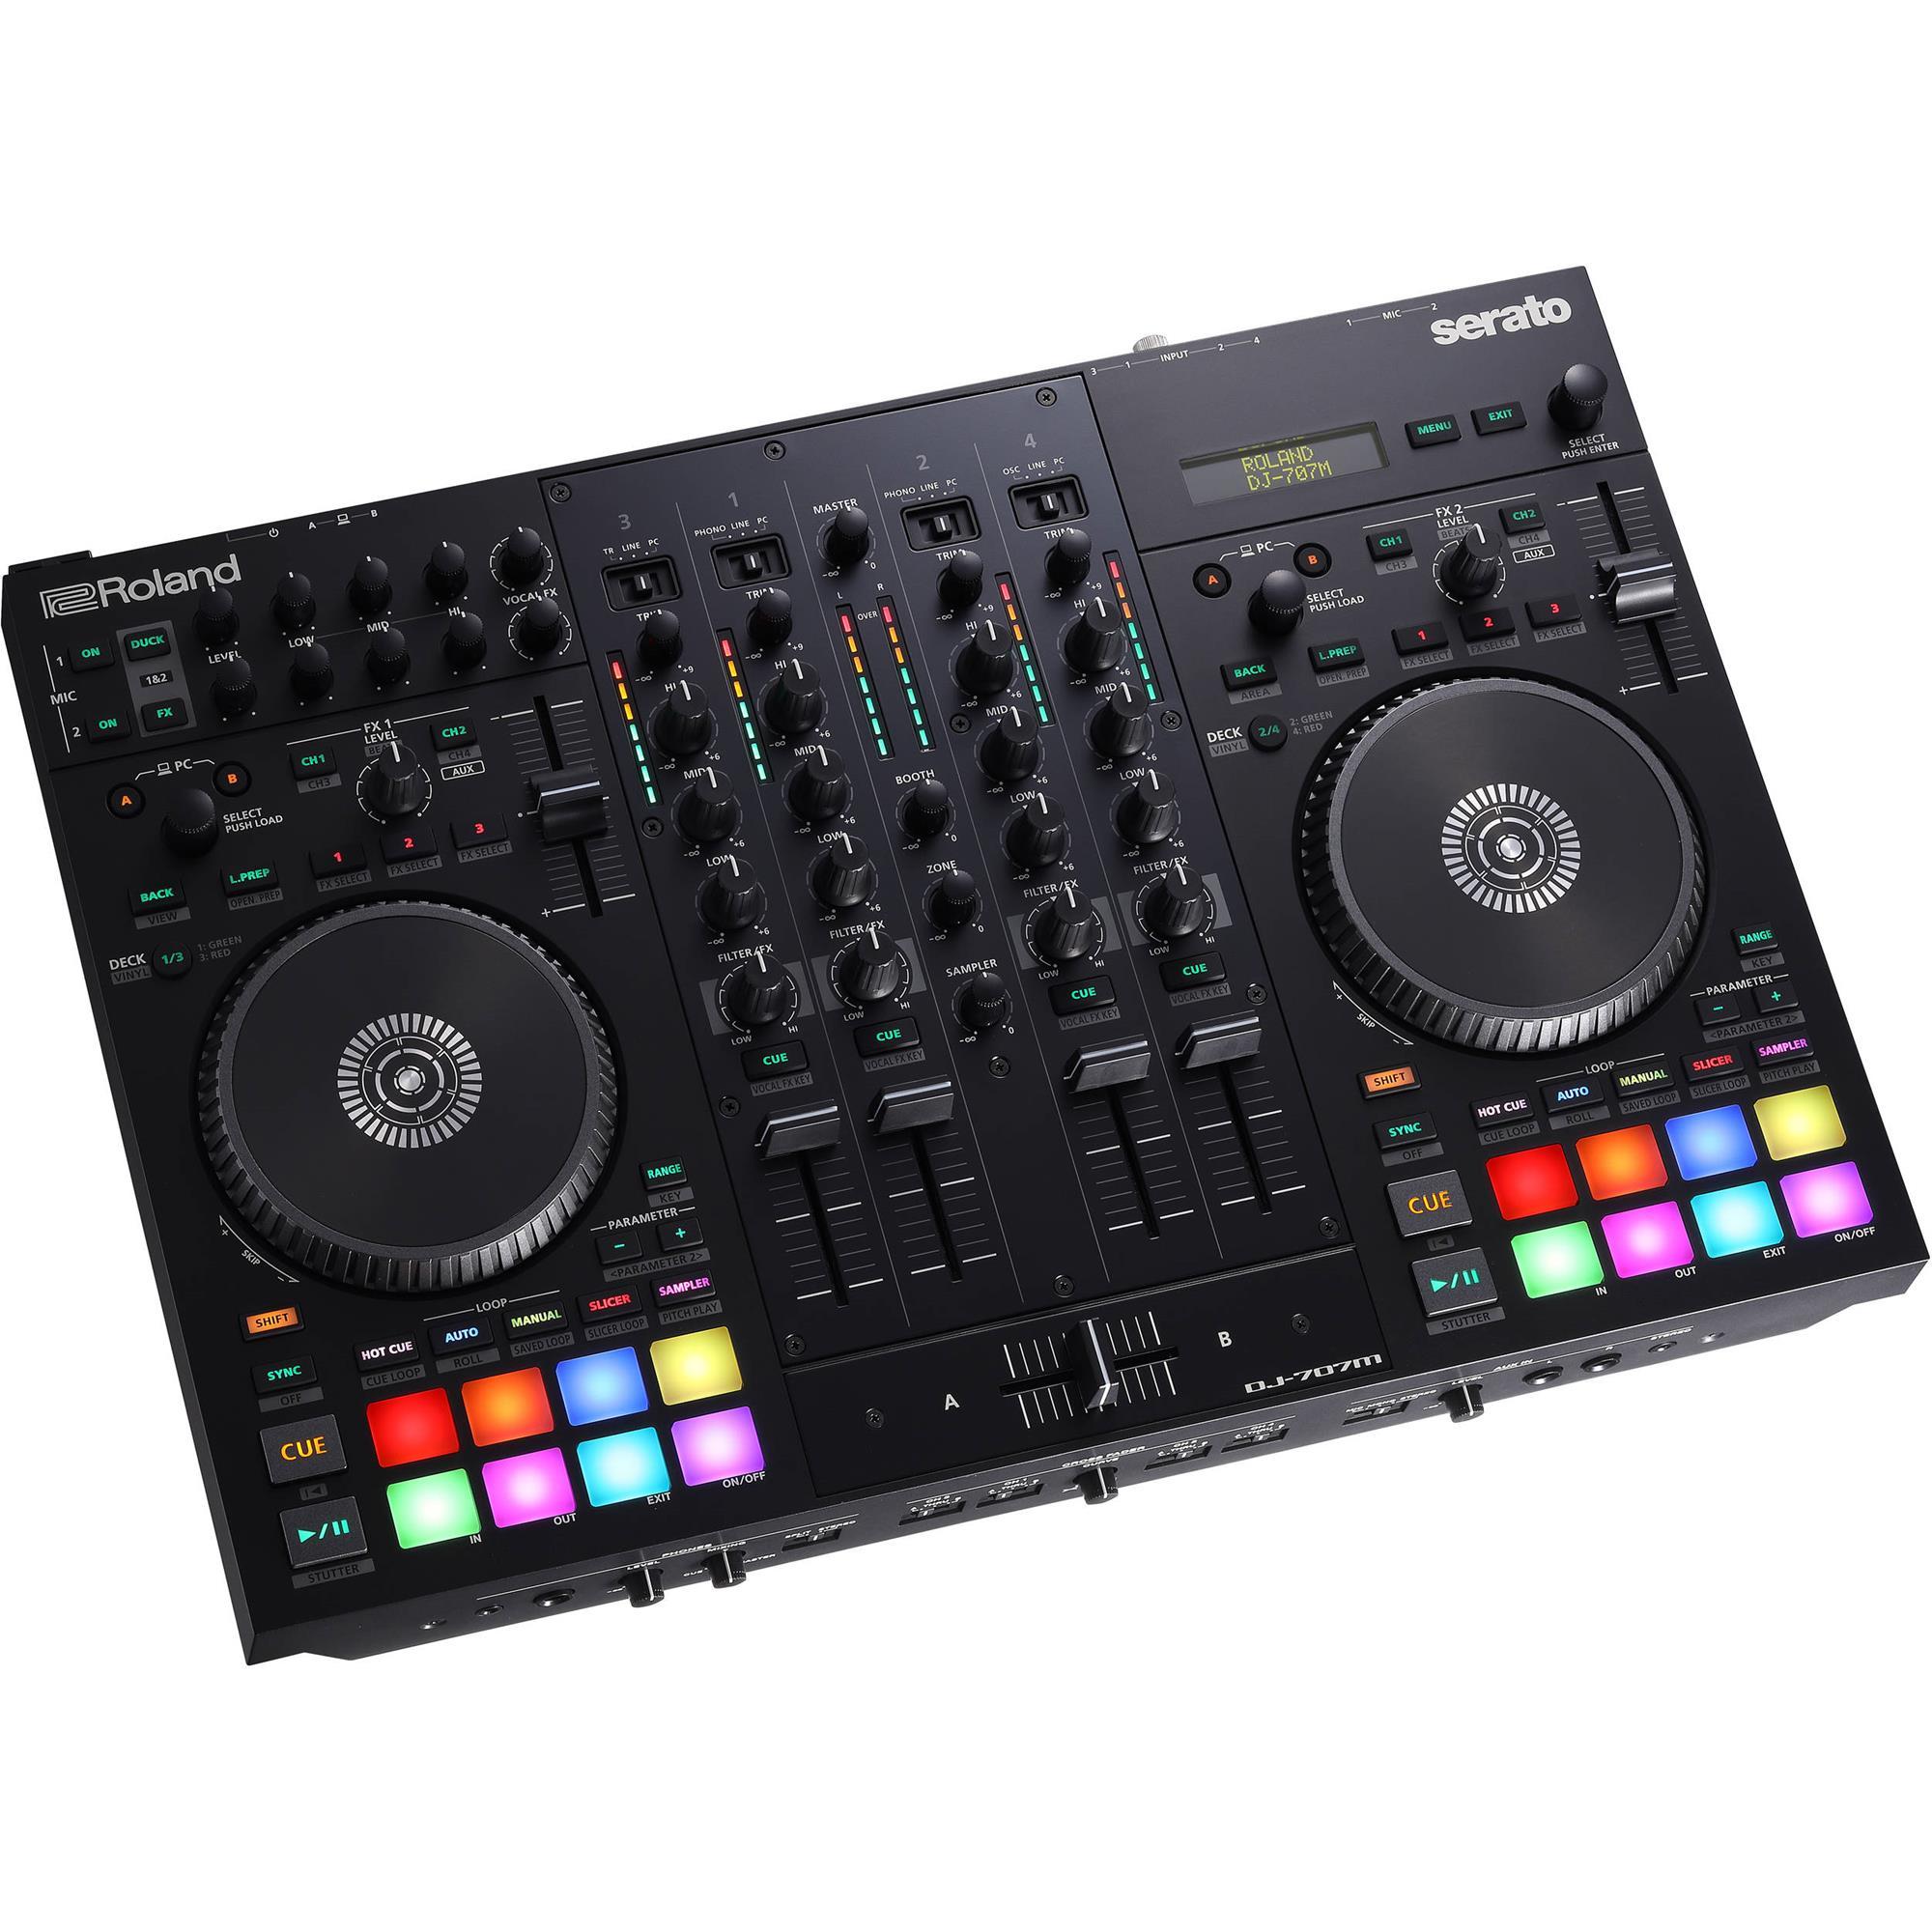 ROLAND-DJ-707M-421411-sku-45362051